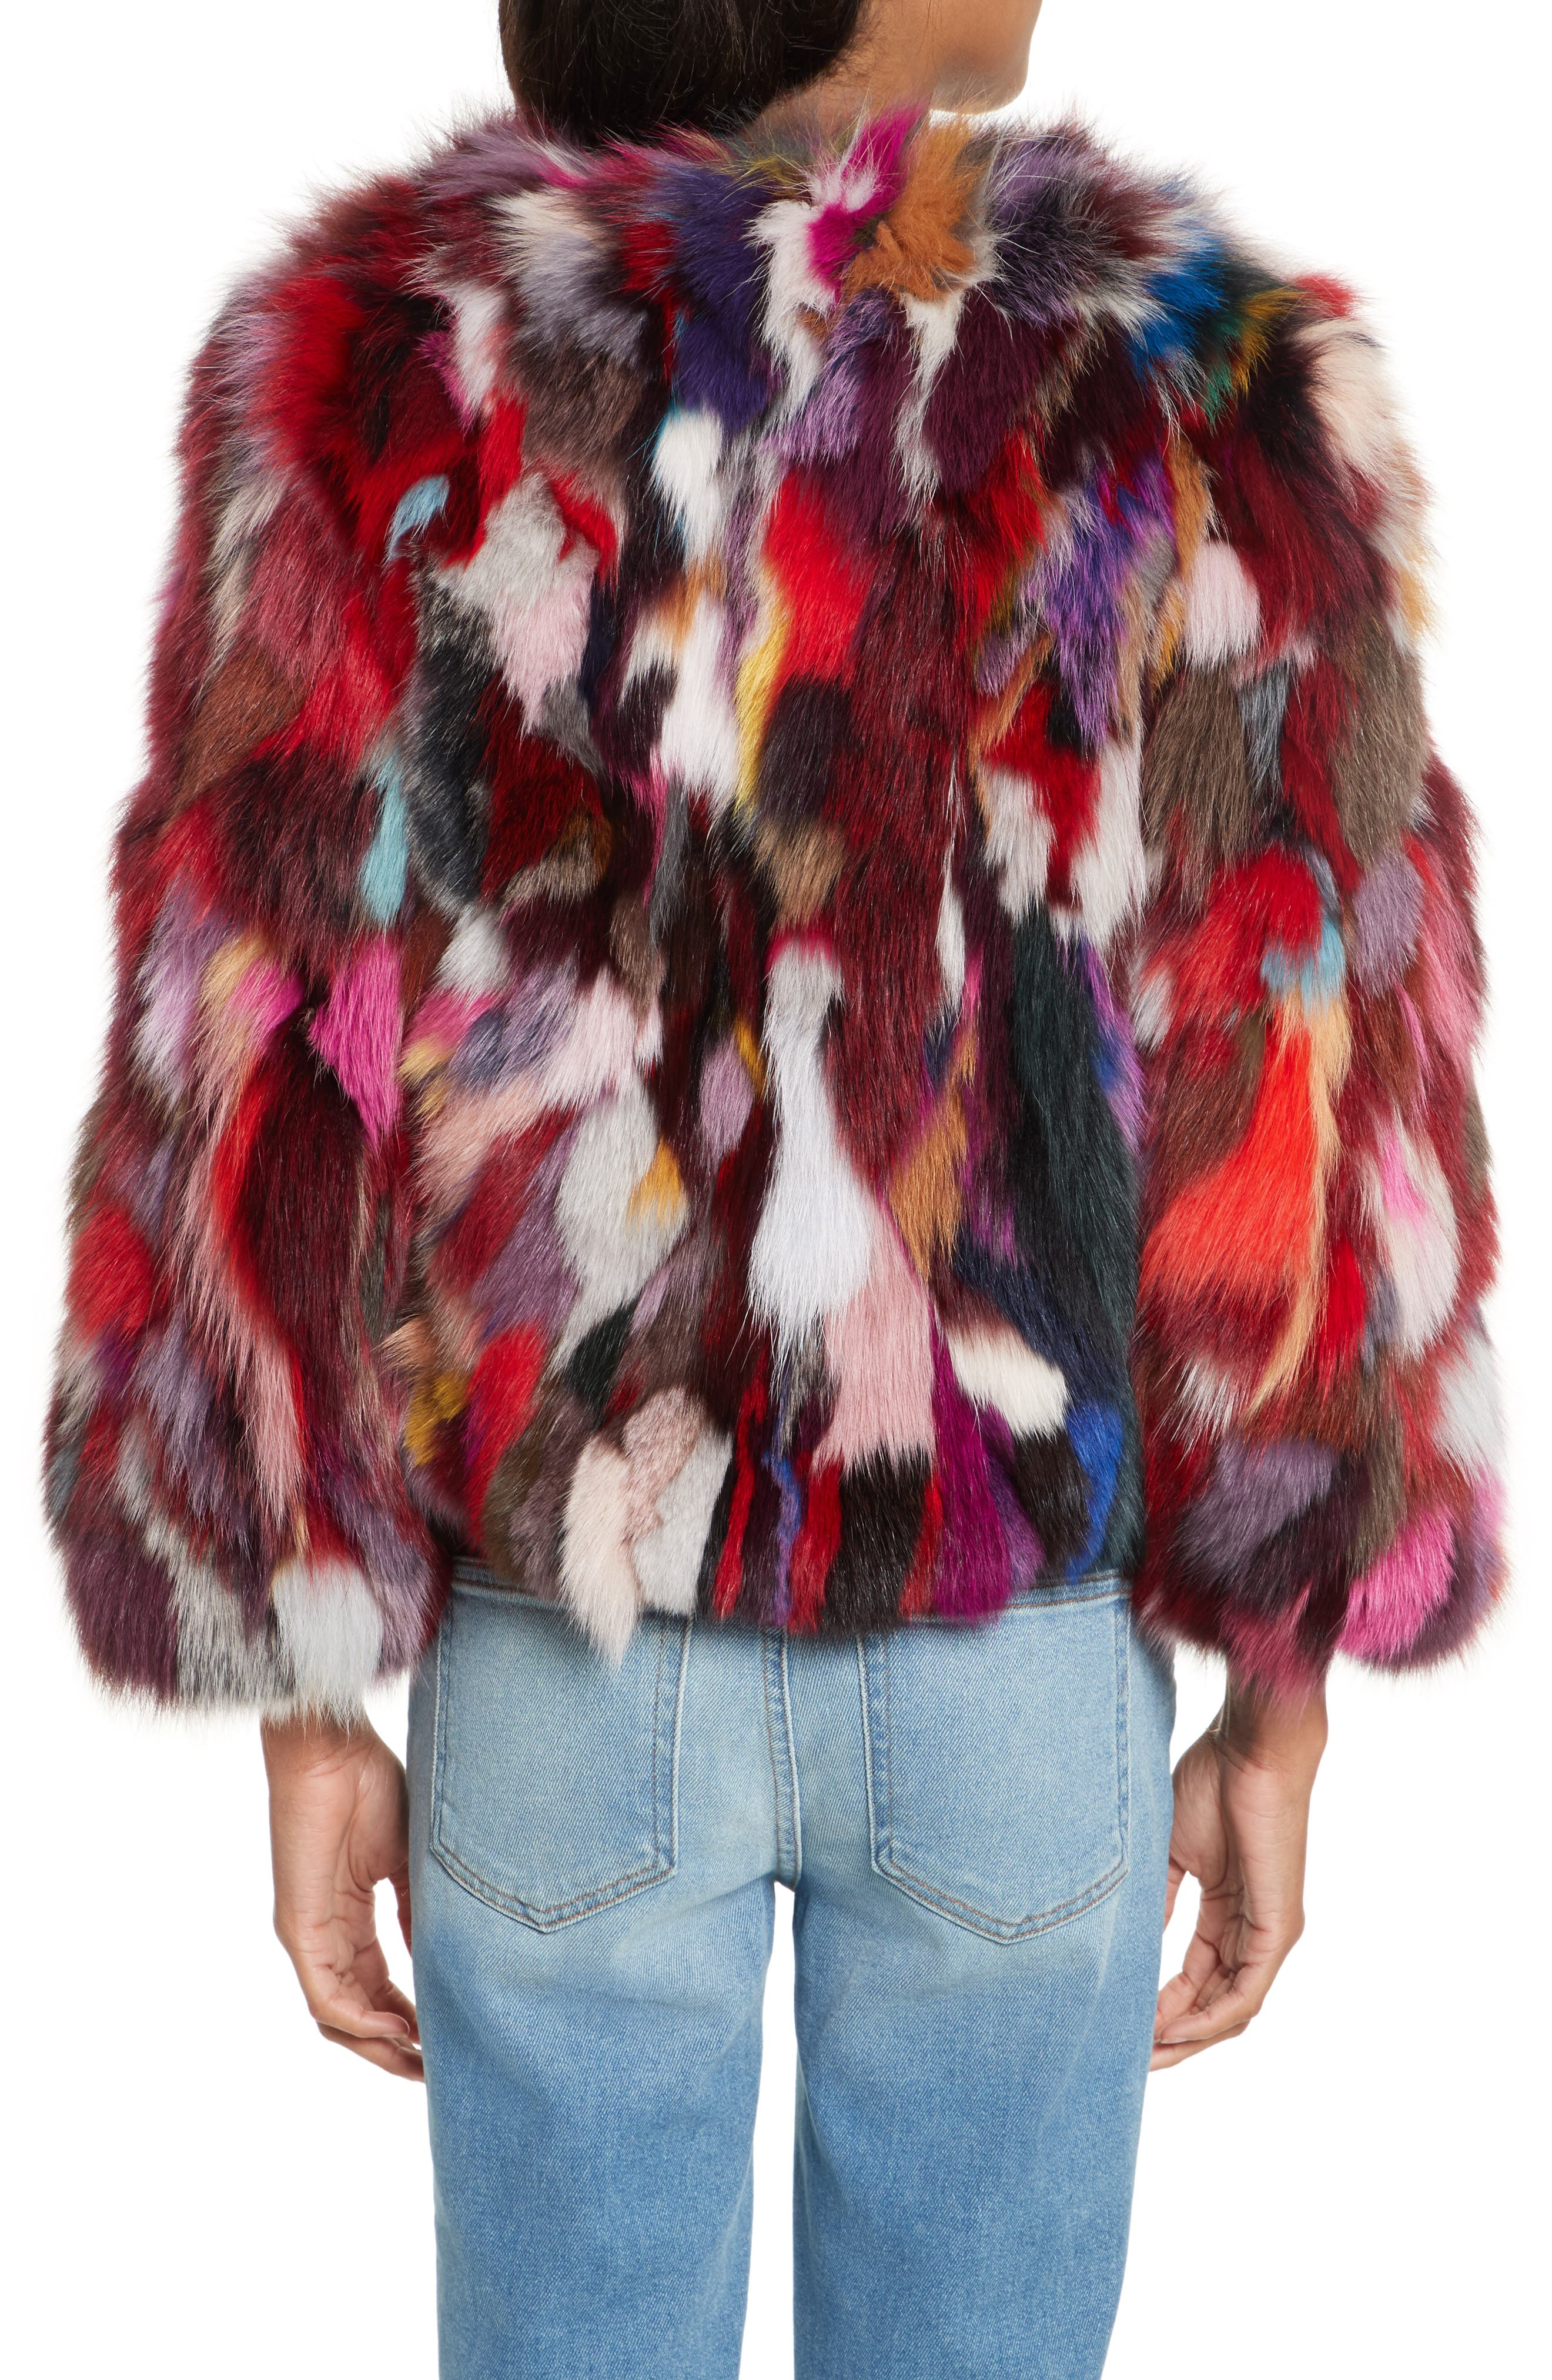 Rachel Genuine Fox Fur Jacket,                             Alternate thumbnail 2, color,                             Multi